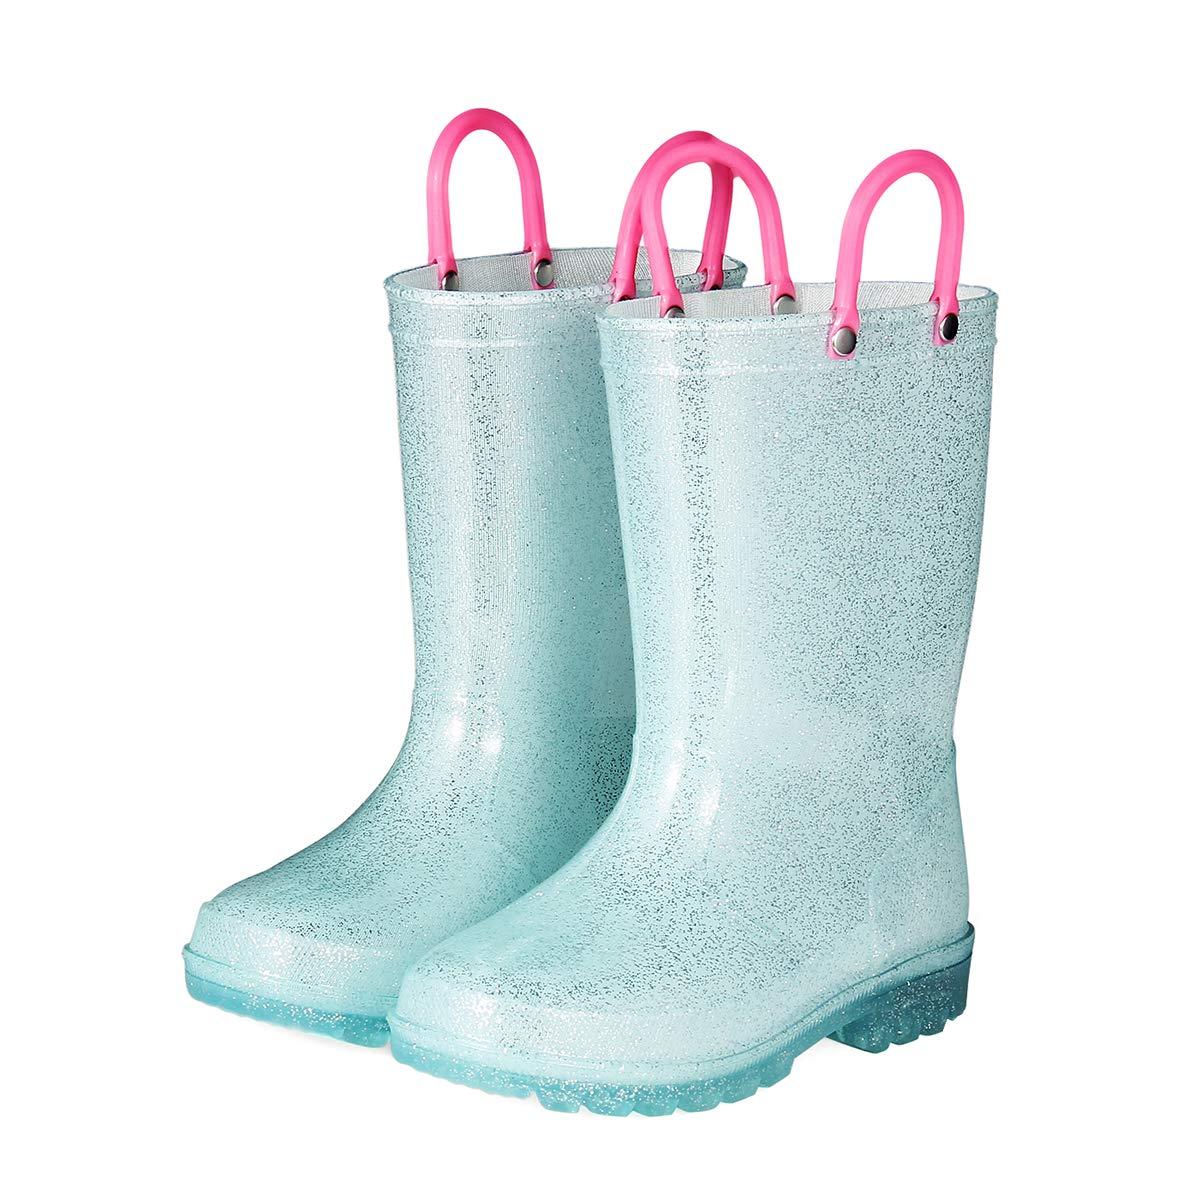 KomForme RPGL054-1M K Light Up Kids Rain Boots Glitter Girl Boots Blue by KomForme (Image #2)